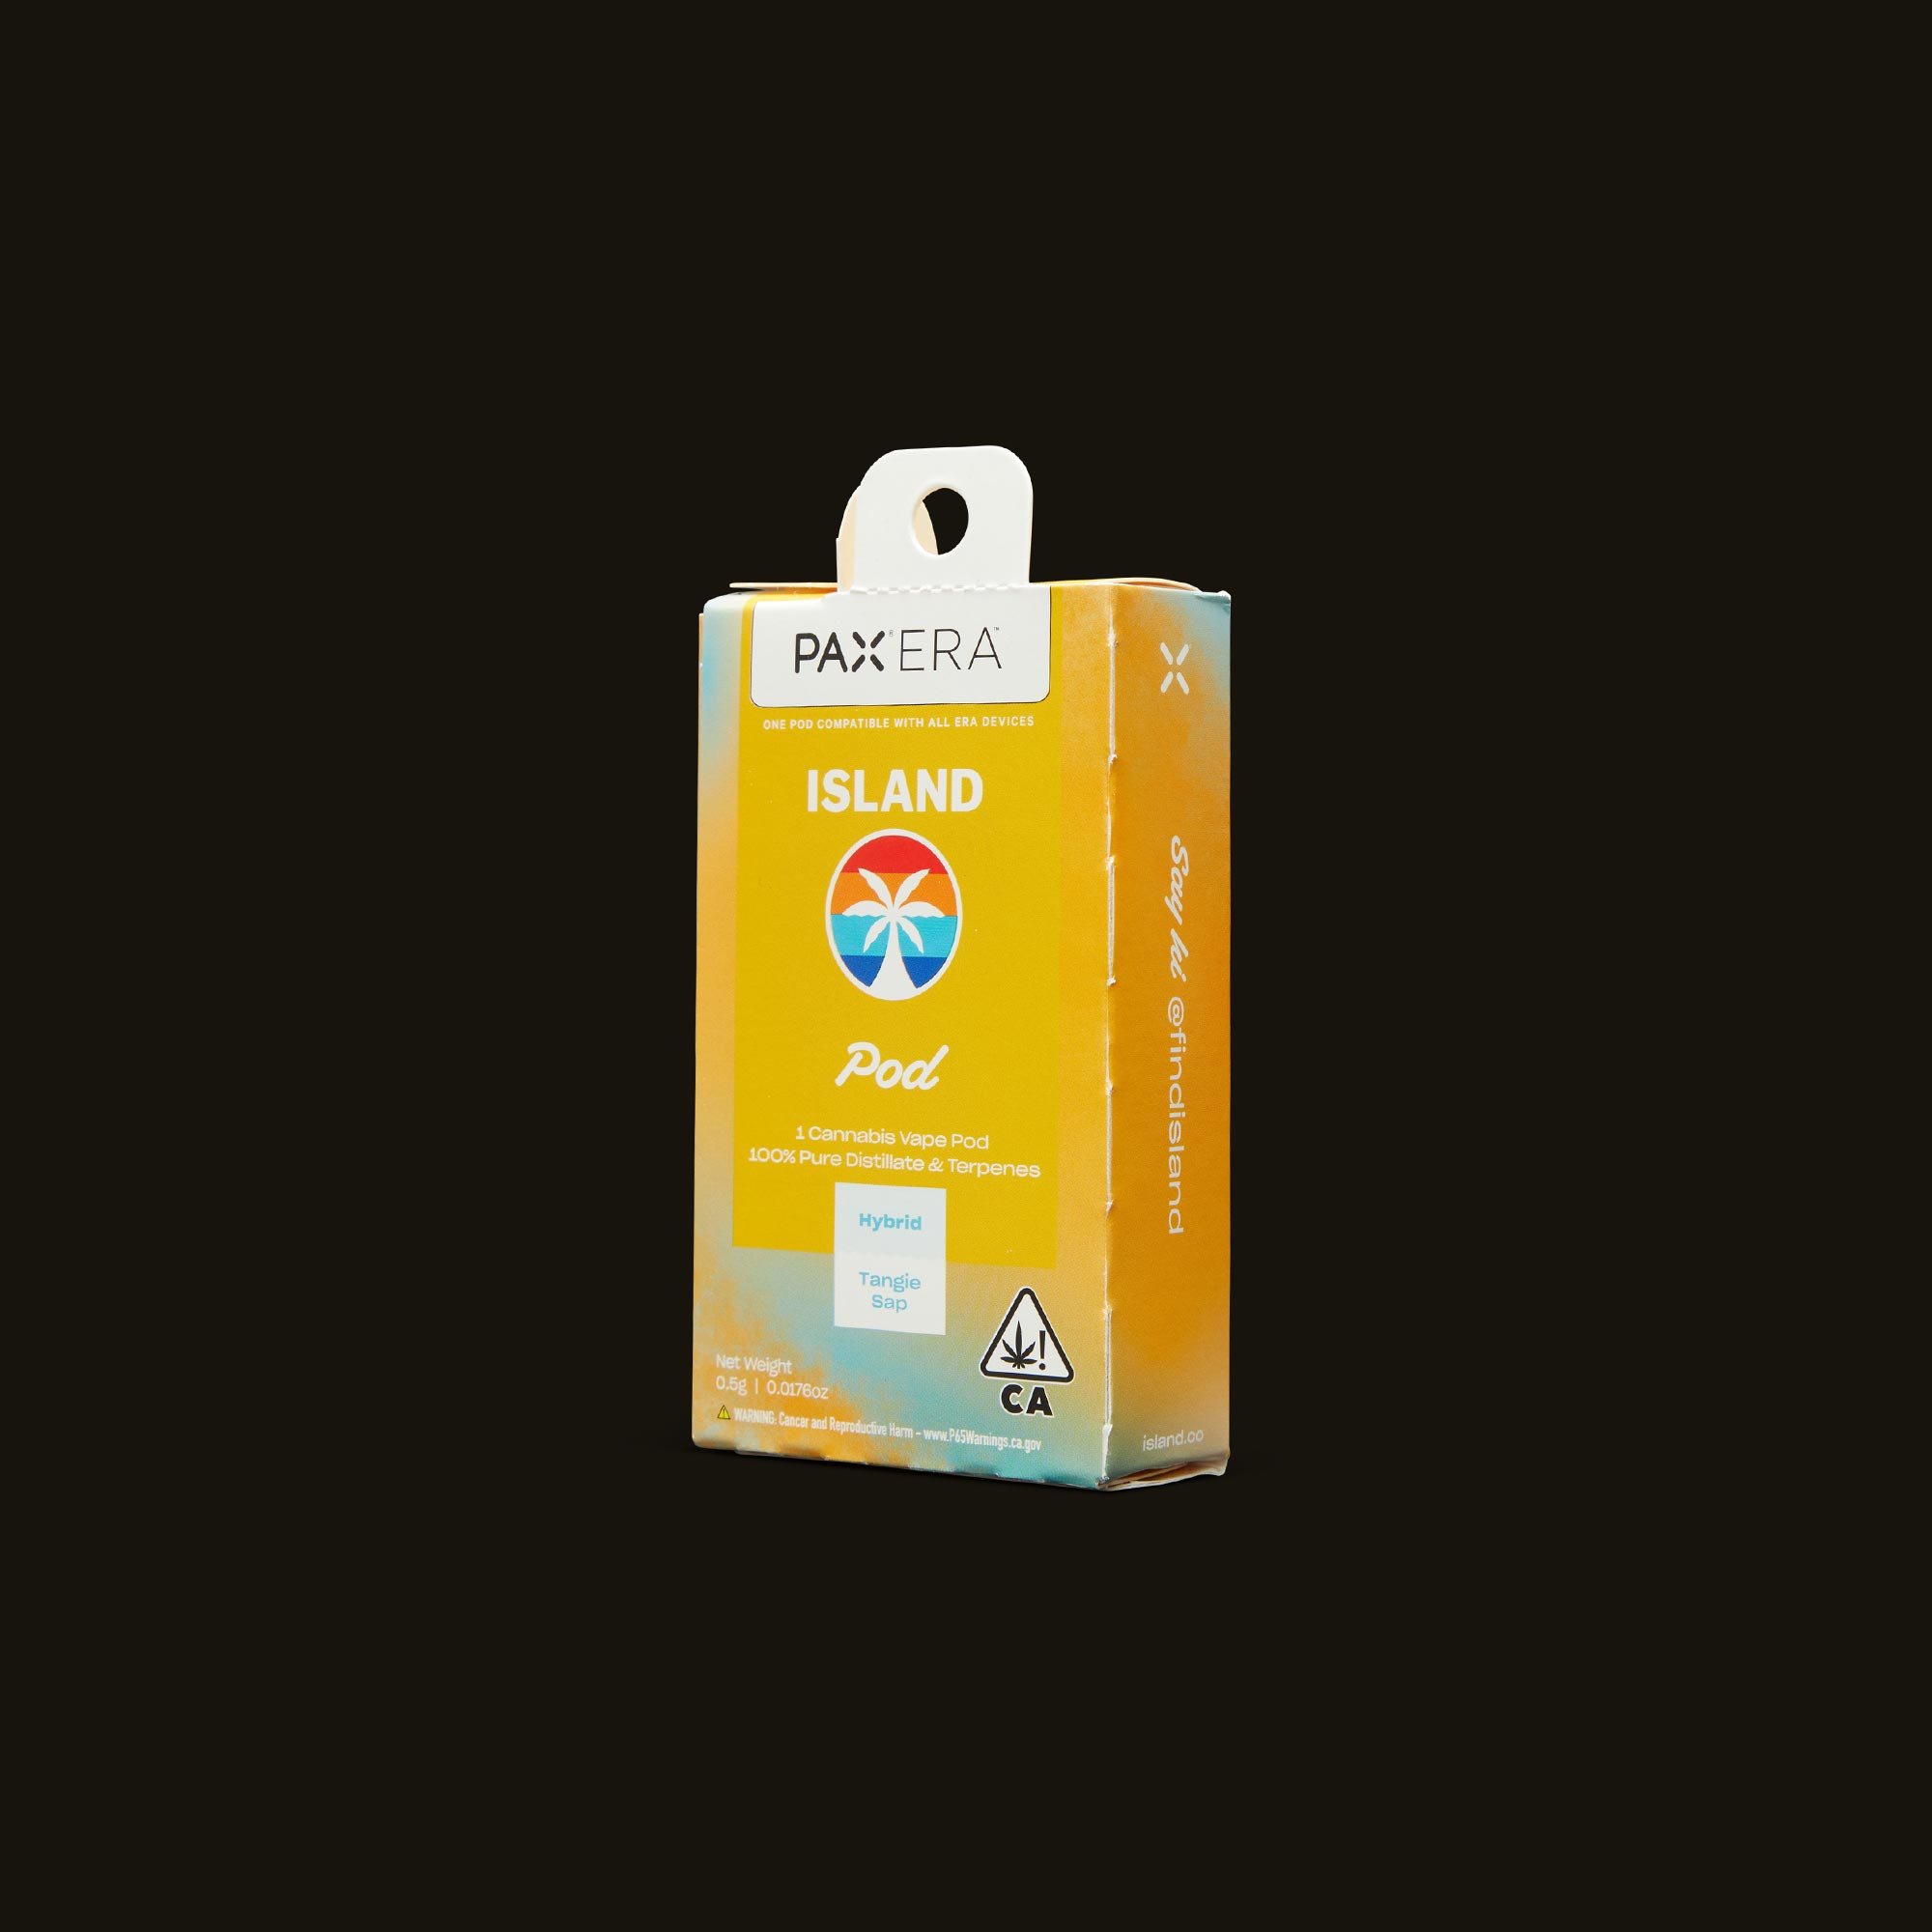 Island Tangie Sap PAX Era Pod Side Packaging